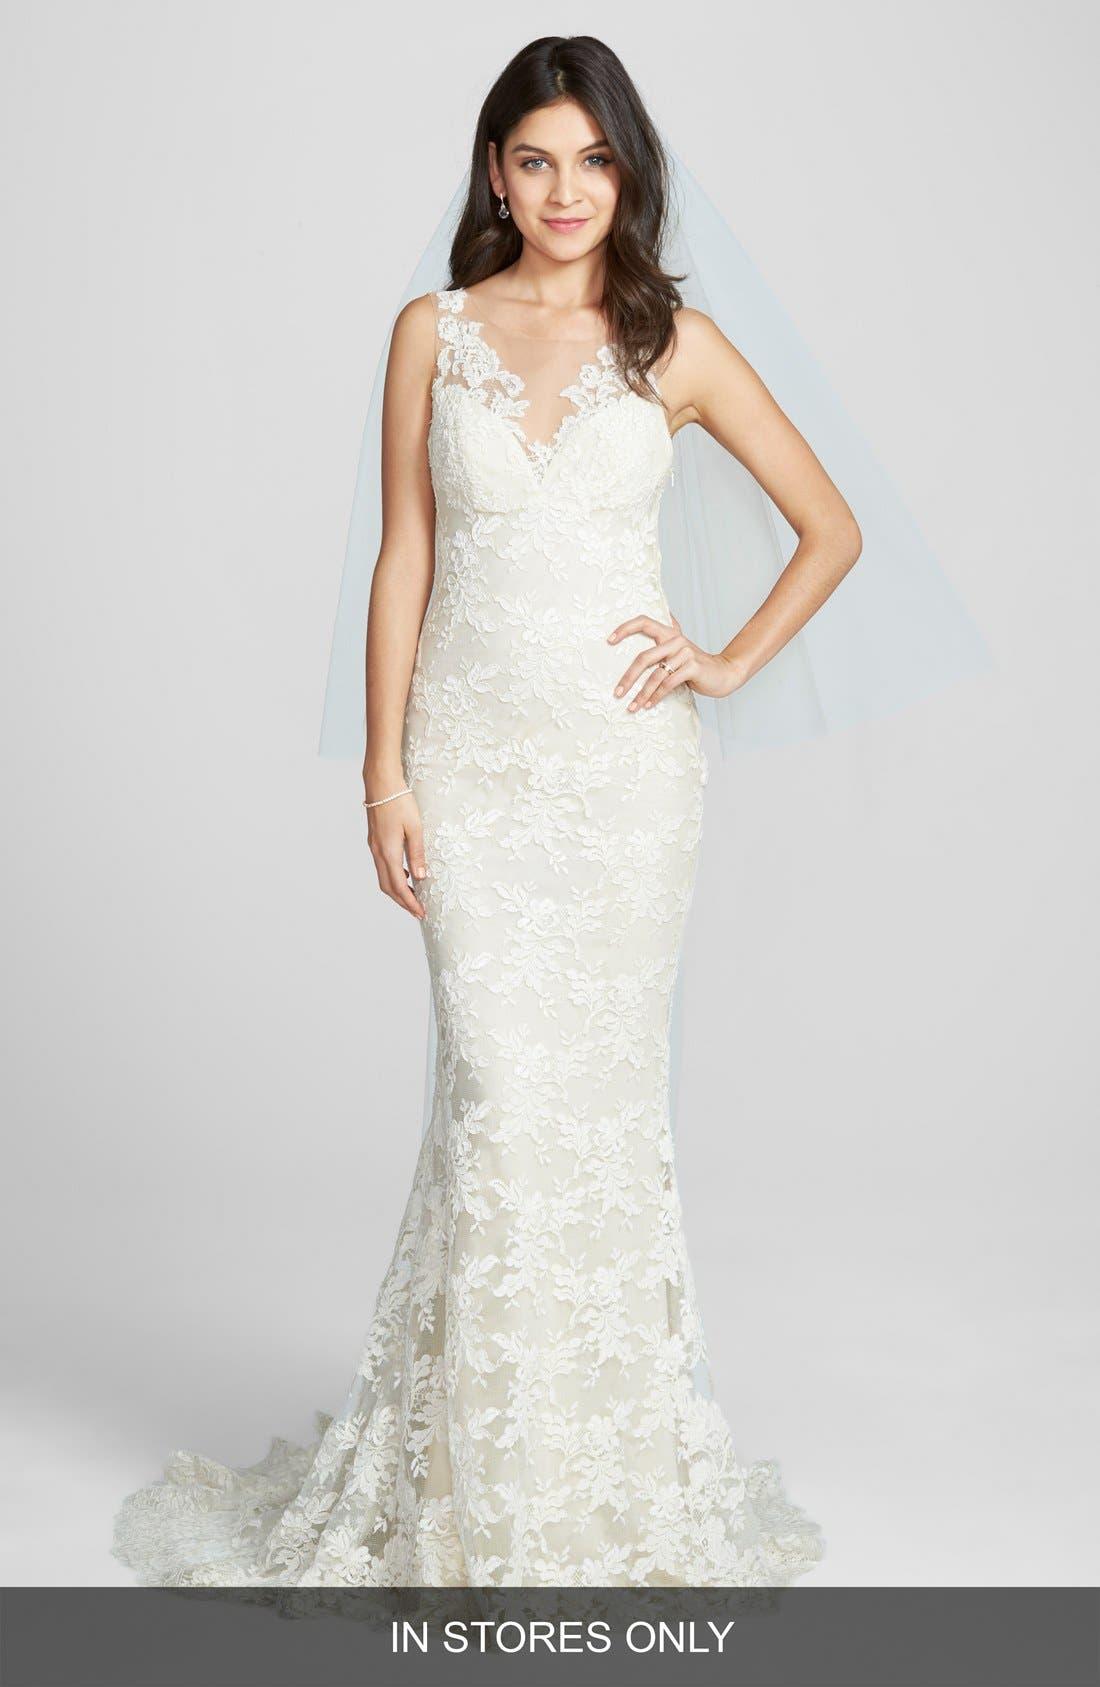 'Nicole' Aleçon Lace Mermaid Dress,                             Main thumbnail 1, color,                             IVORY/ VANILLA